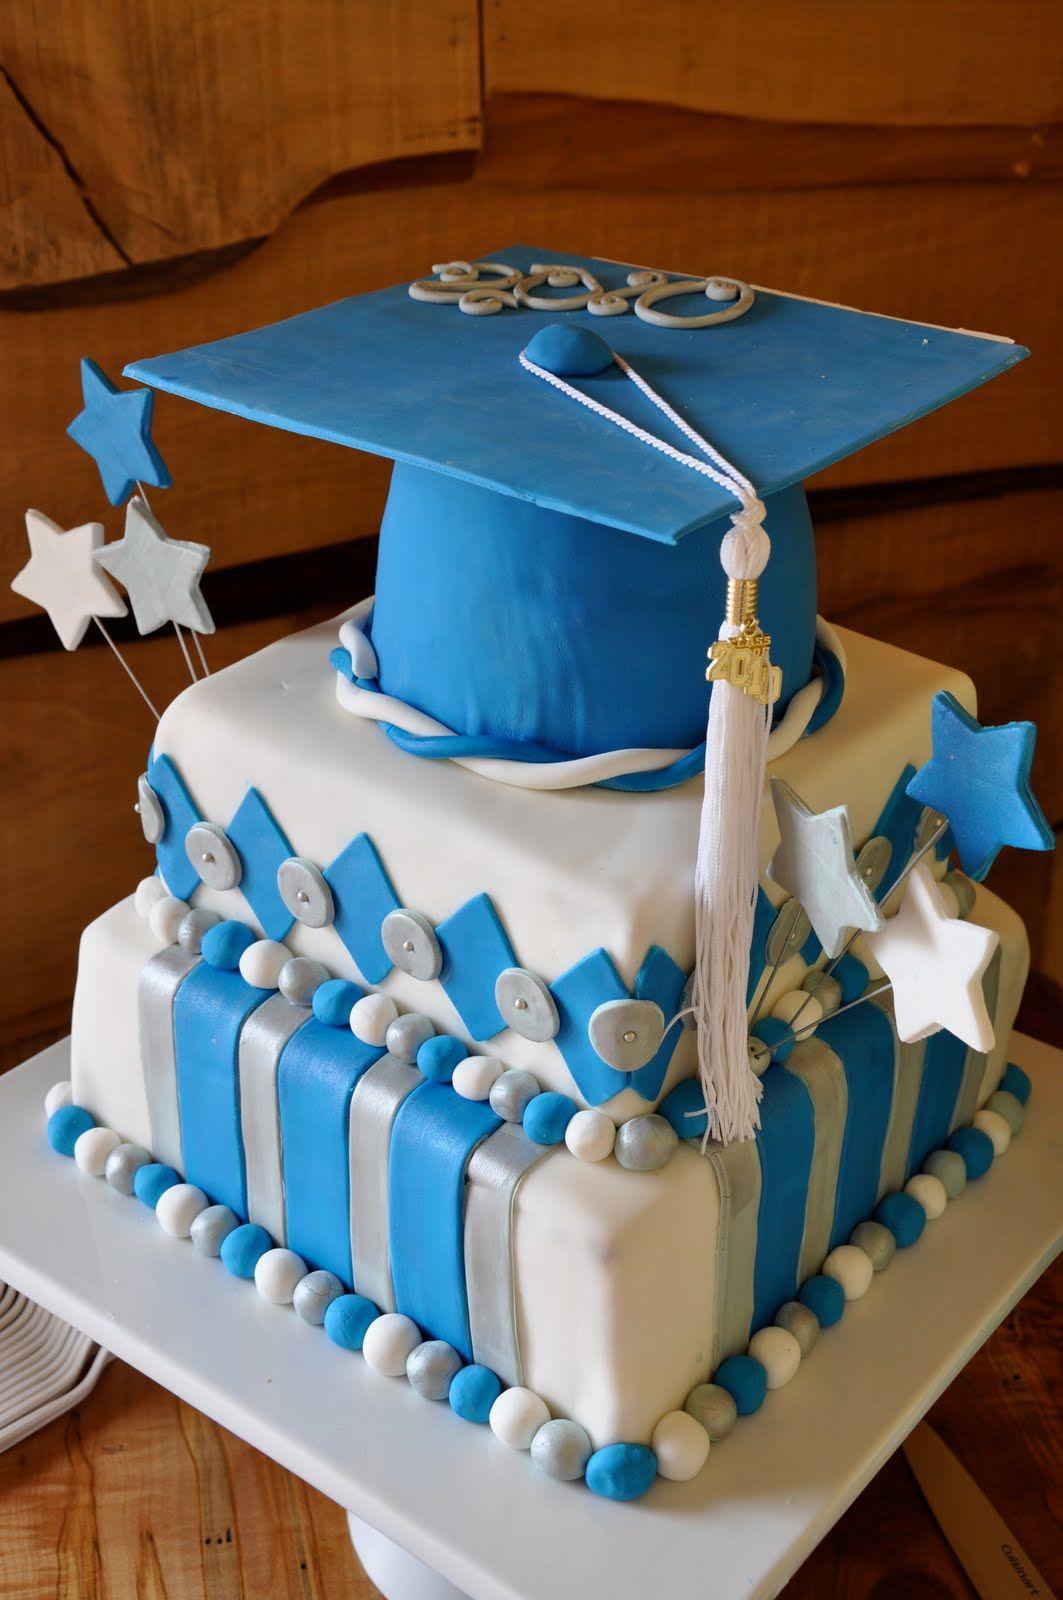 Graduation cap cake ideas sunday may 9 2010